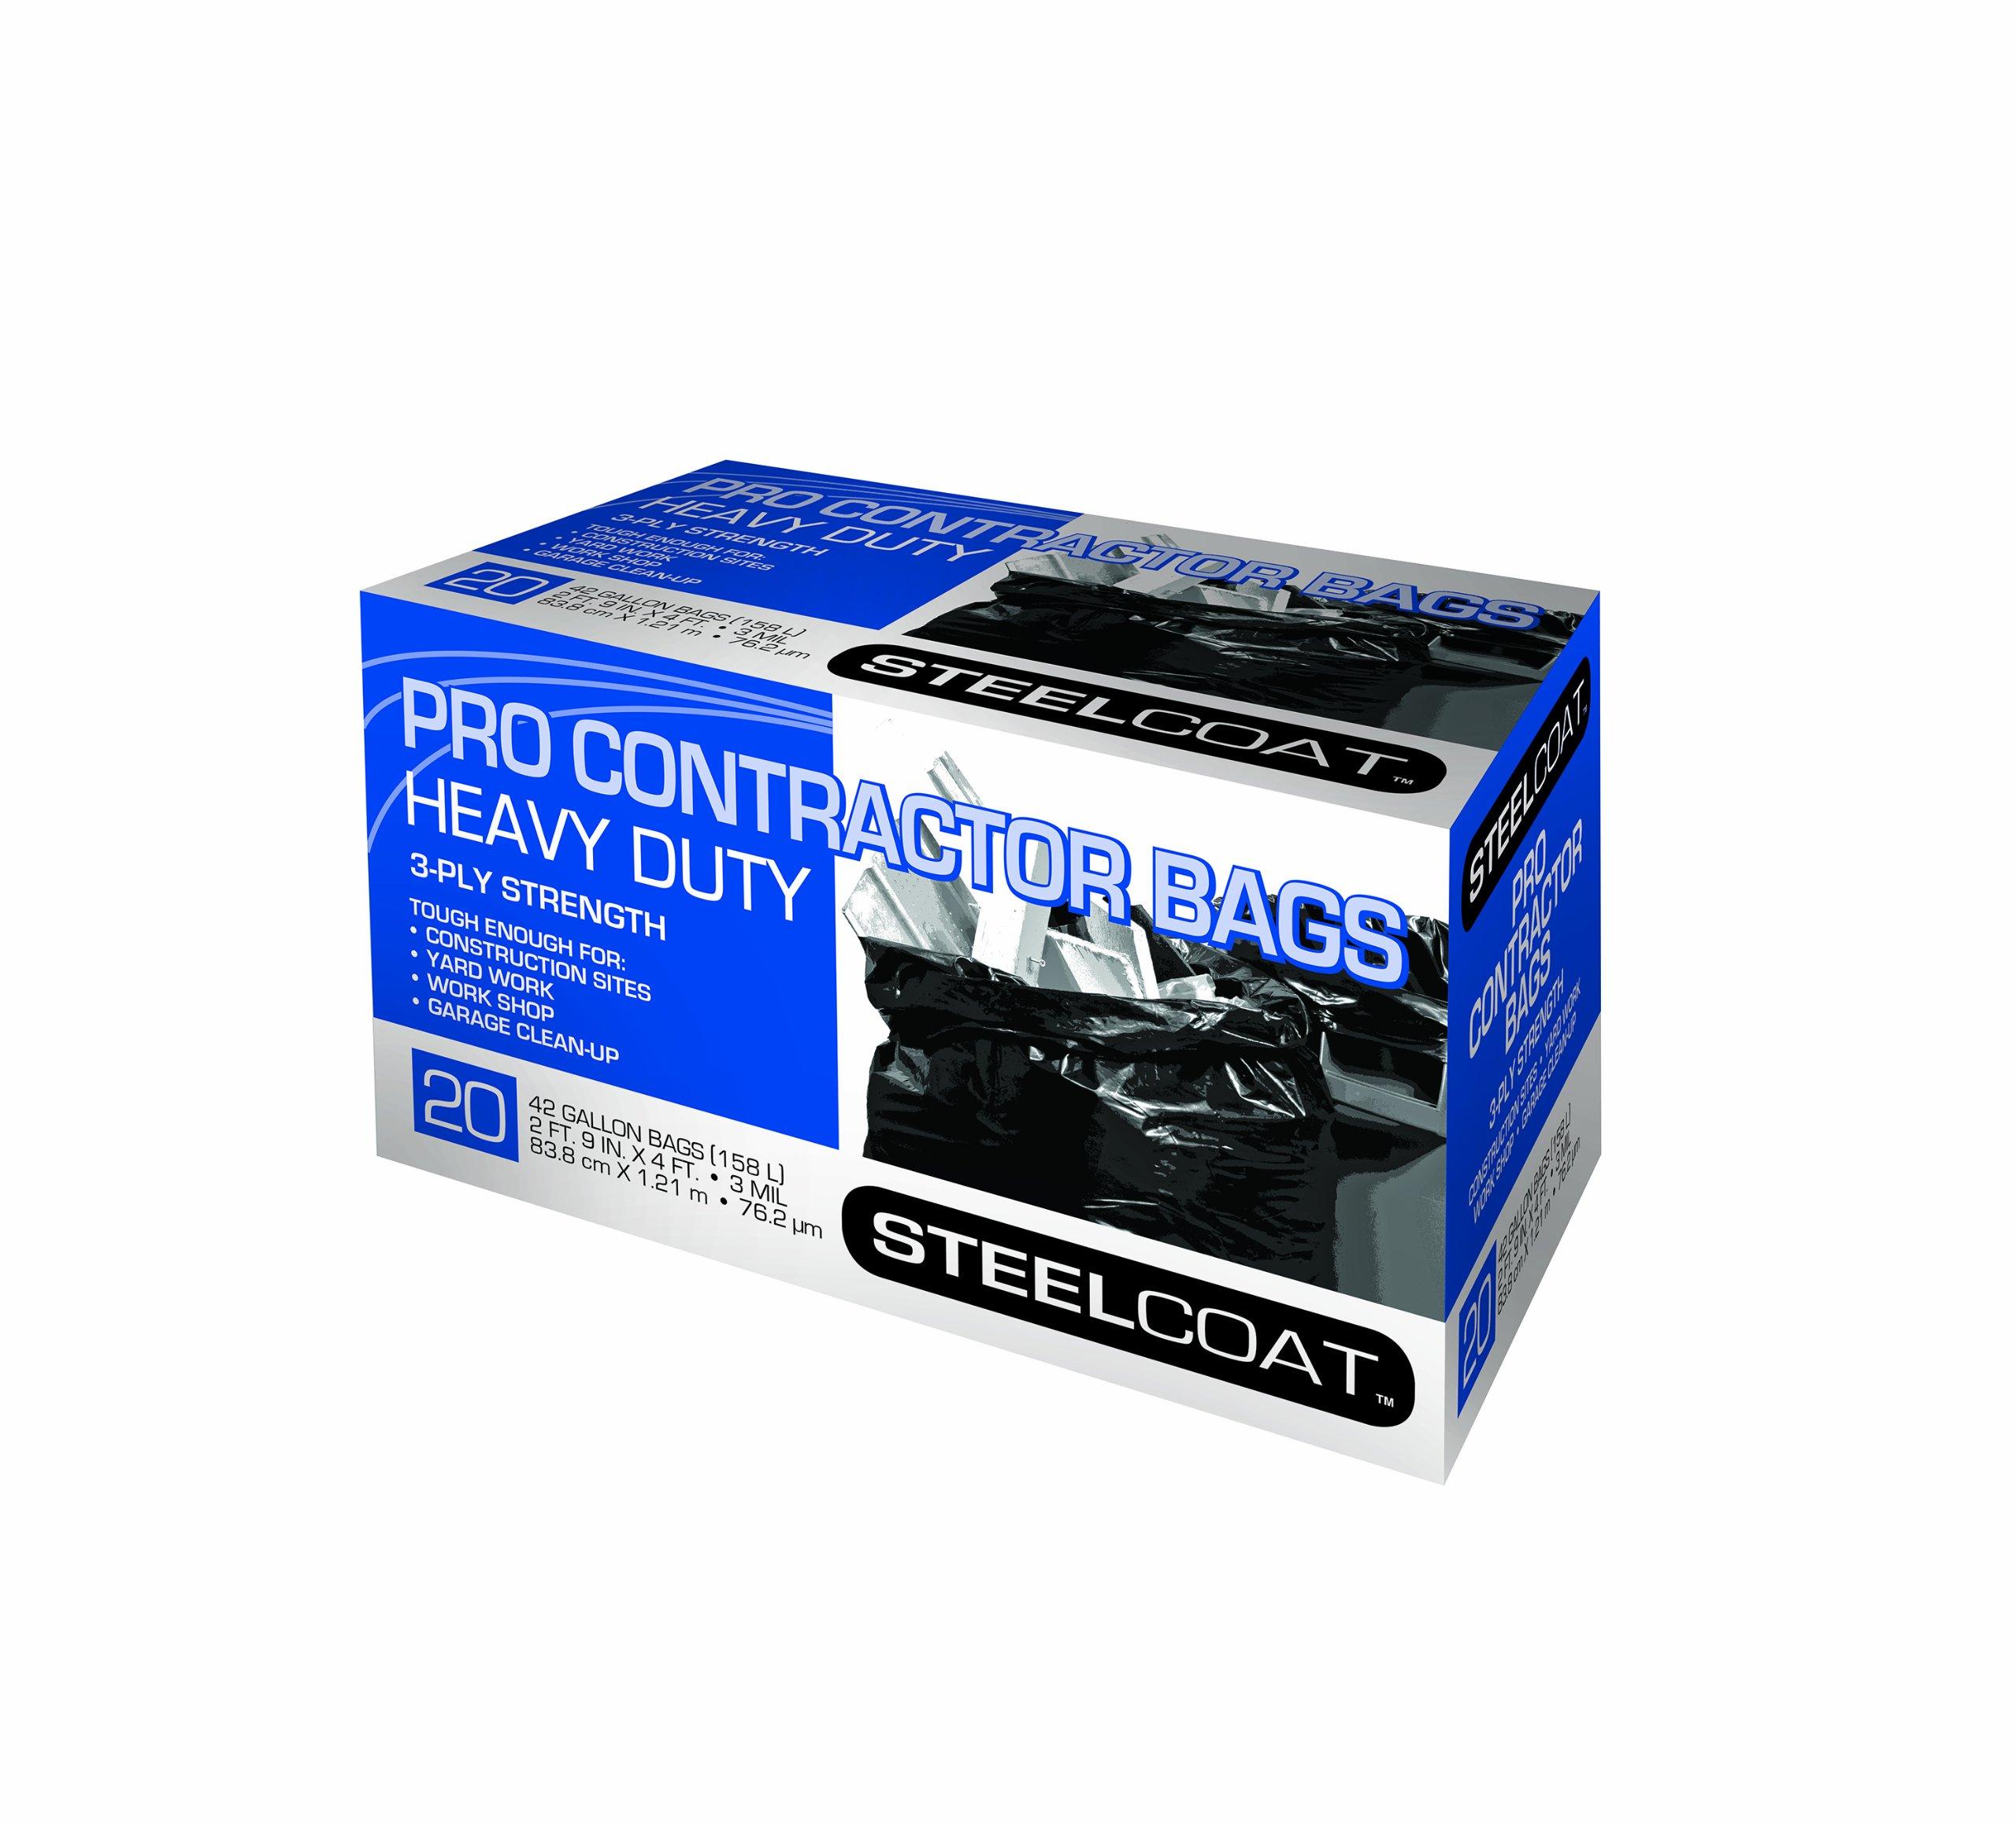 Petoskey Plastics 94105 Steelcoat Heavy Duty Pro Contractor Trash Bags, 42-Gallon, Black, 20-Pack by Petoskey Plastics